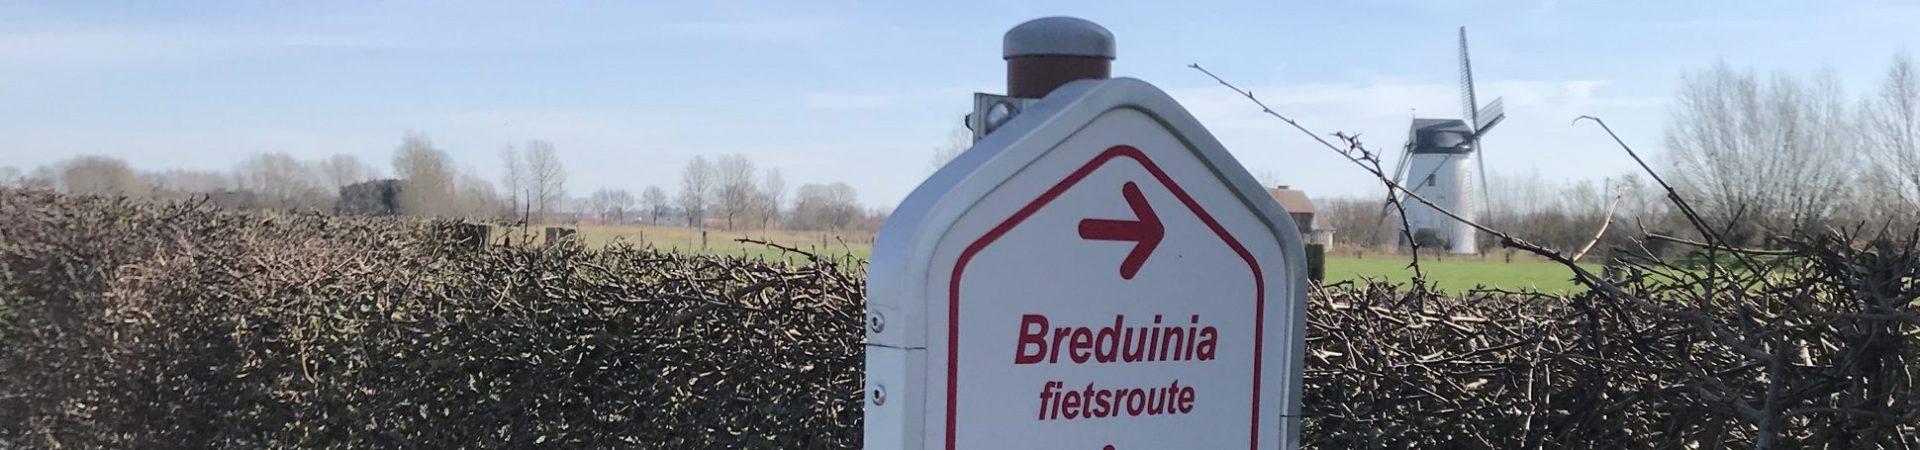 Fietsroute fietsblog review fietslus fietsverslagen Breduinia